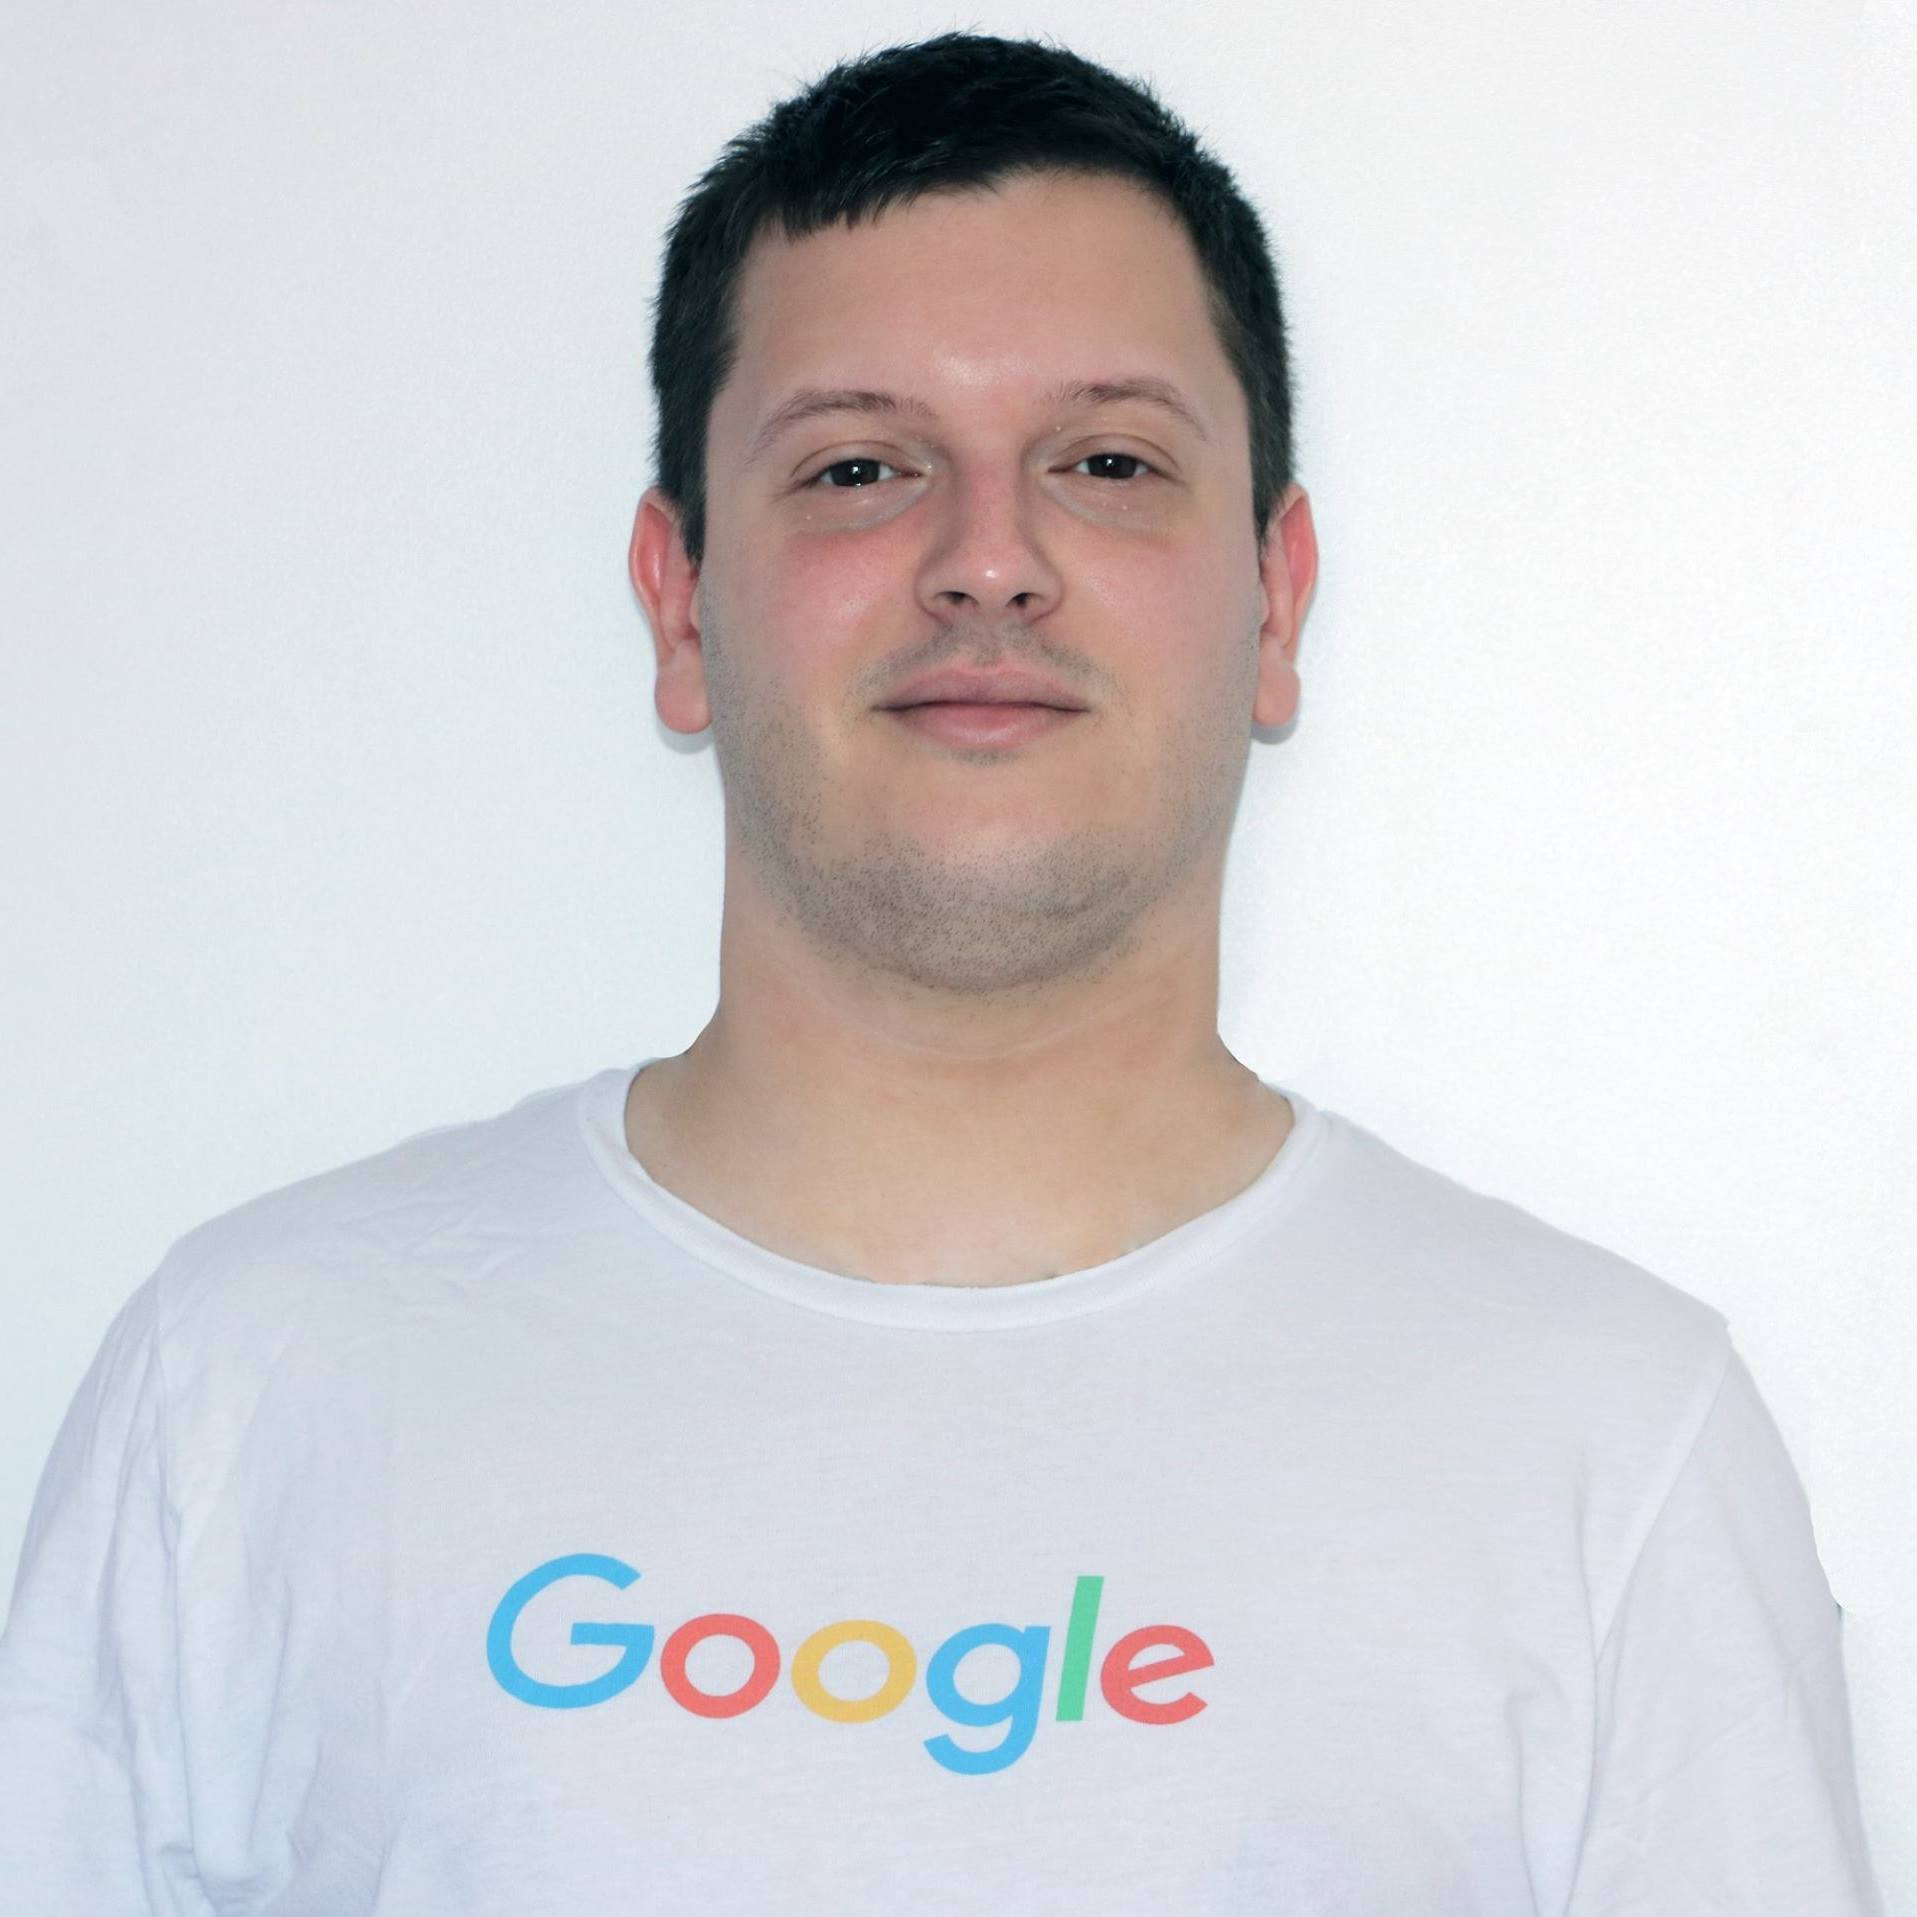 Dido Grigorov